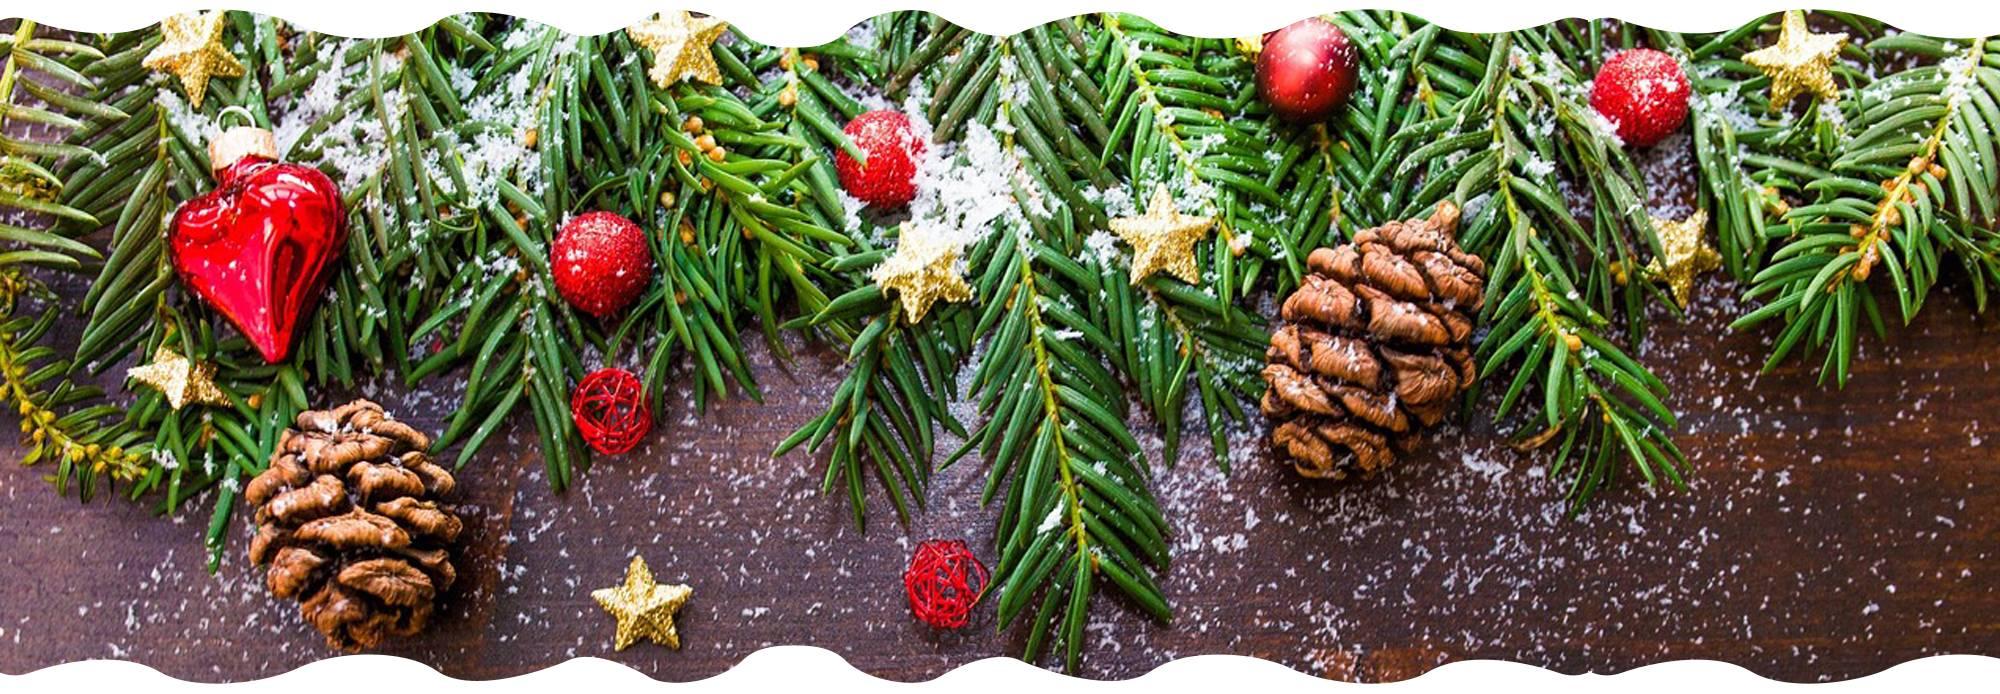 christmas-tree-campaign-gardencenternews-customer-will